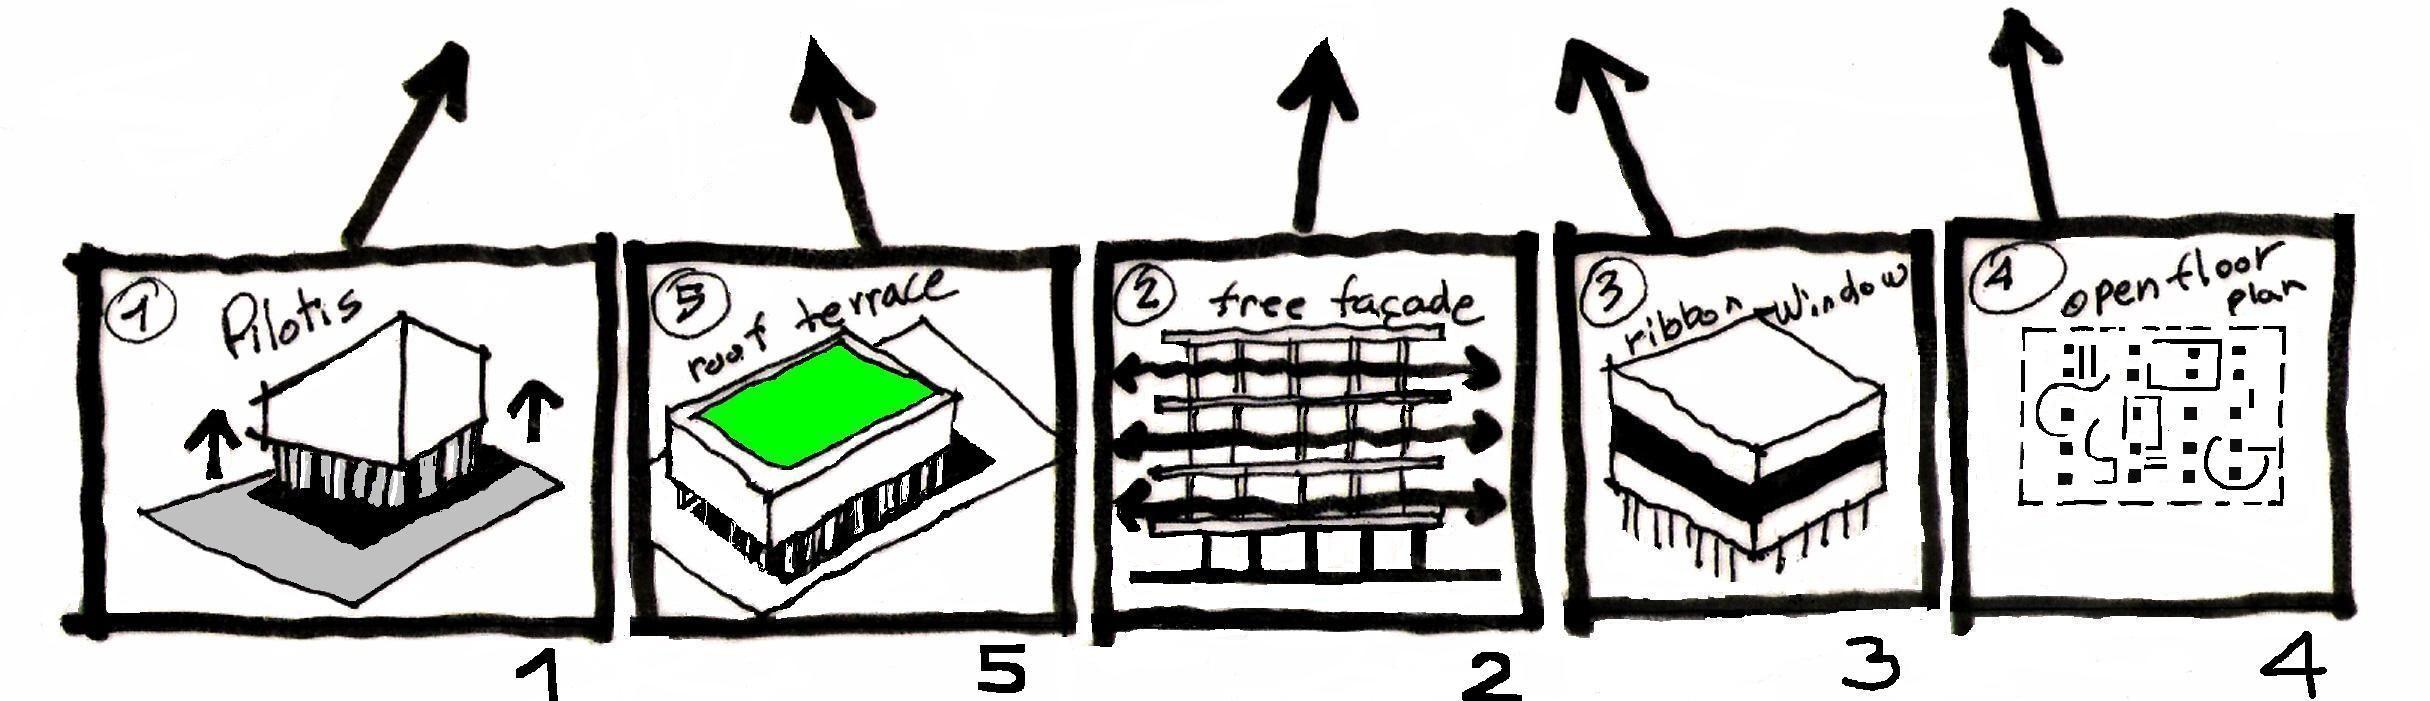 Http Eliinbar Files Wordpress Com 2013 06 Le Corbusier Five